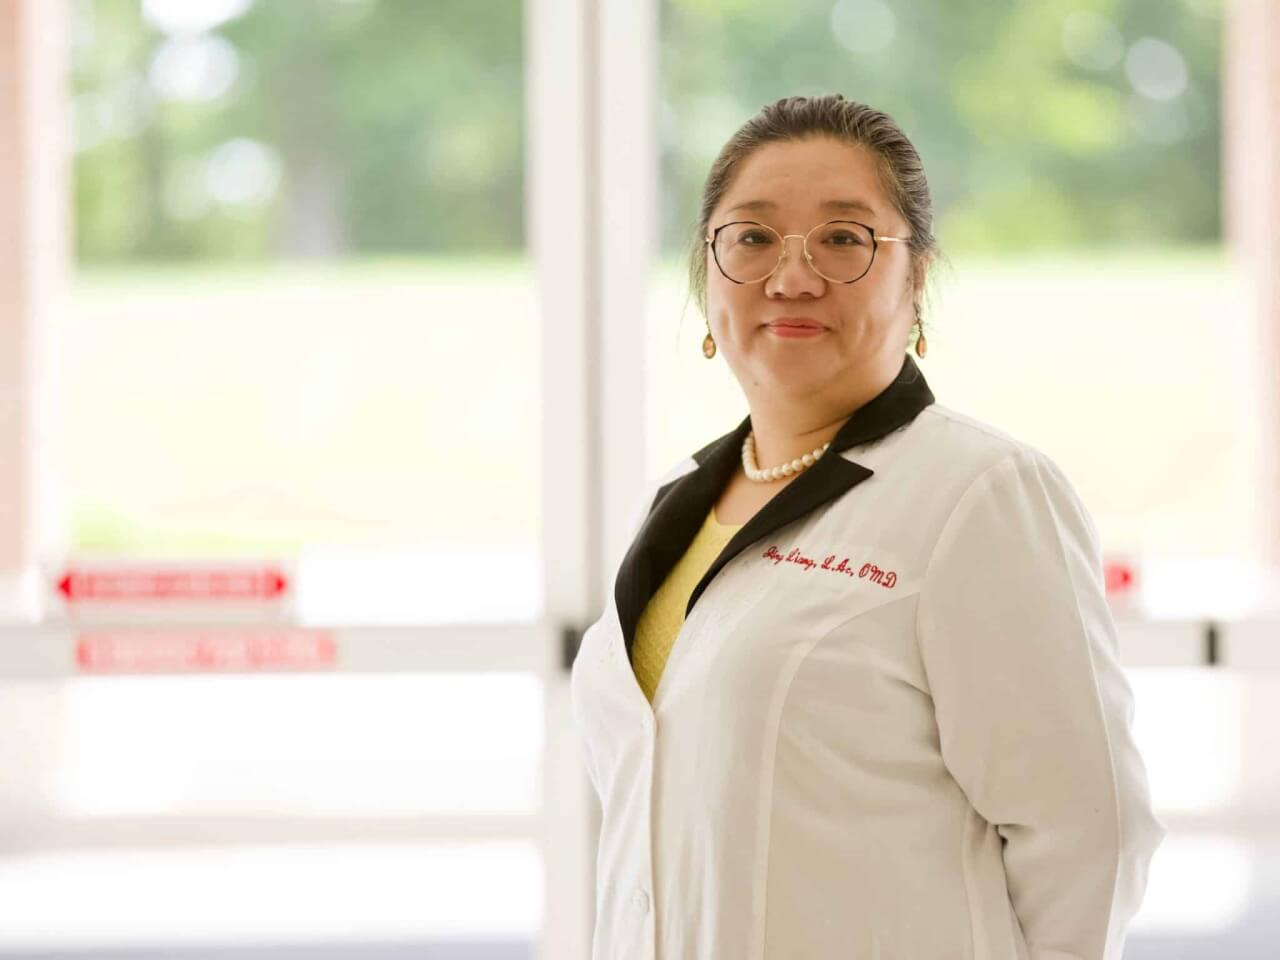 Dr. Jing (Jannifer) H. Liang